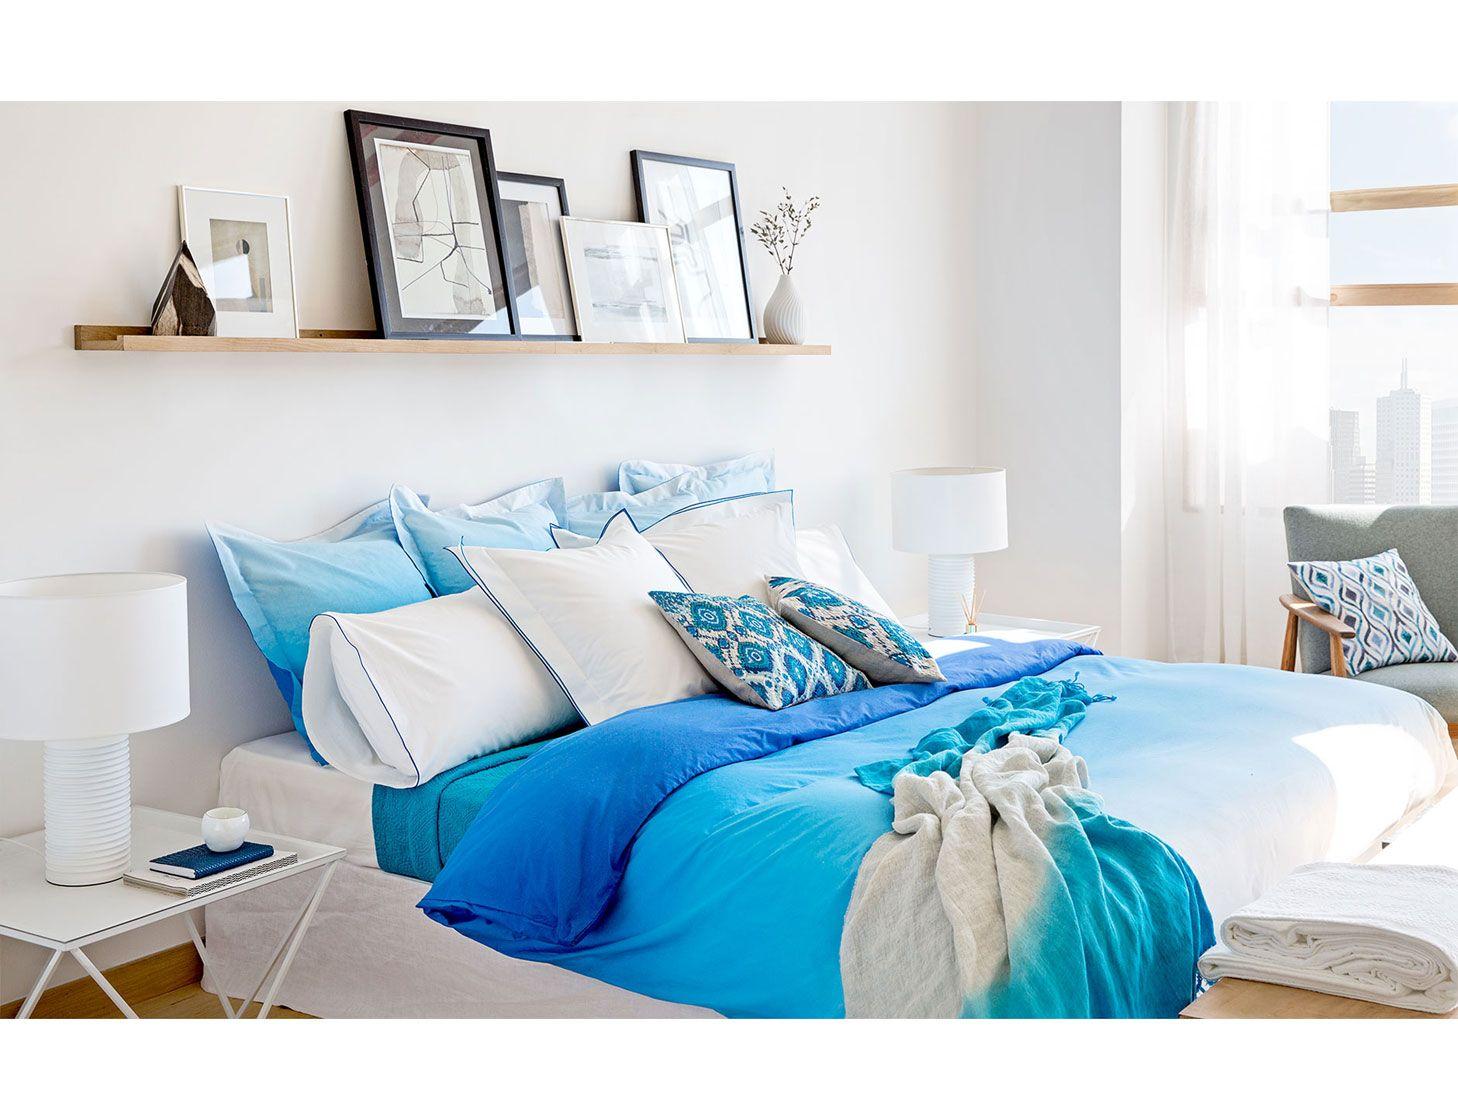 Jaipur lookbook editorials zara home portugal decora o decora o - Zara home portugal ...